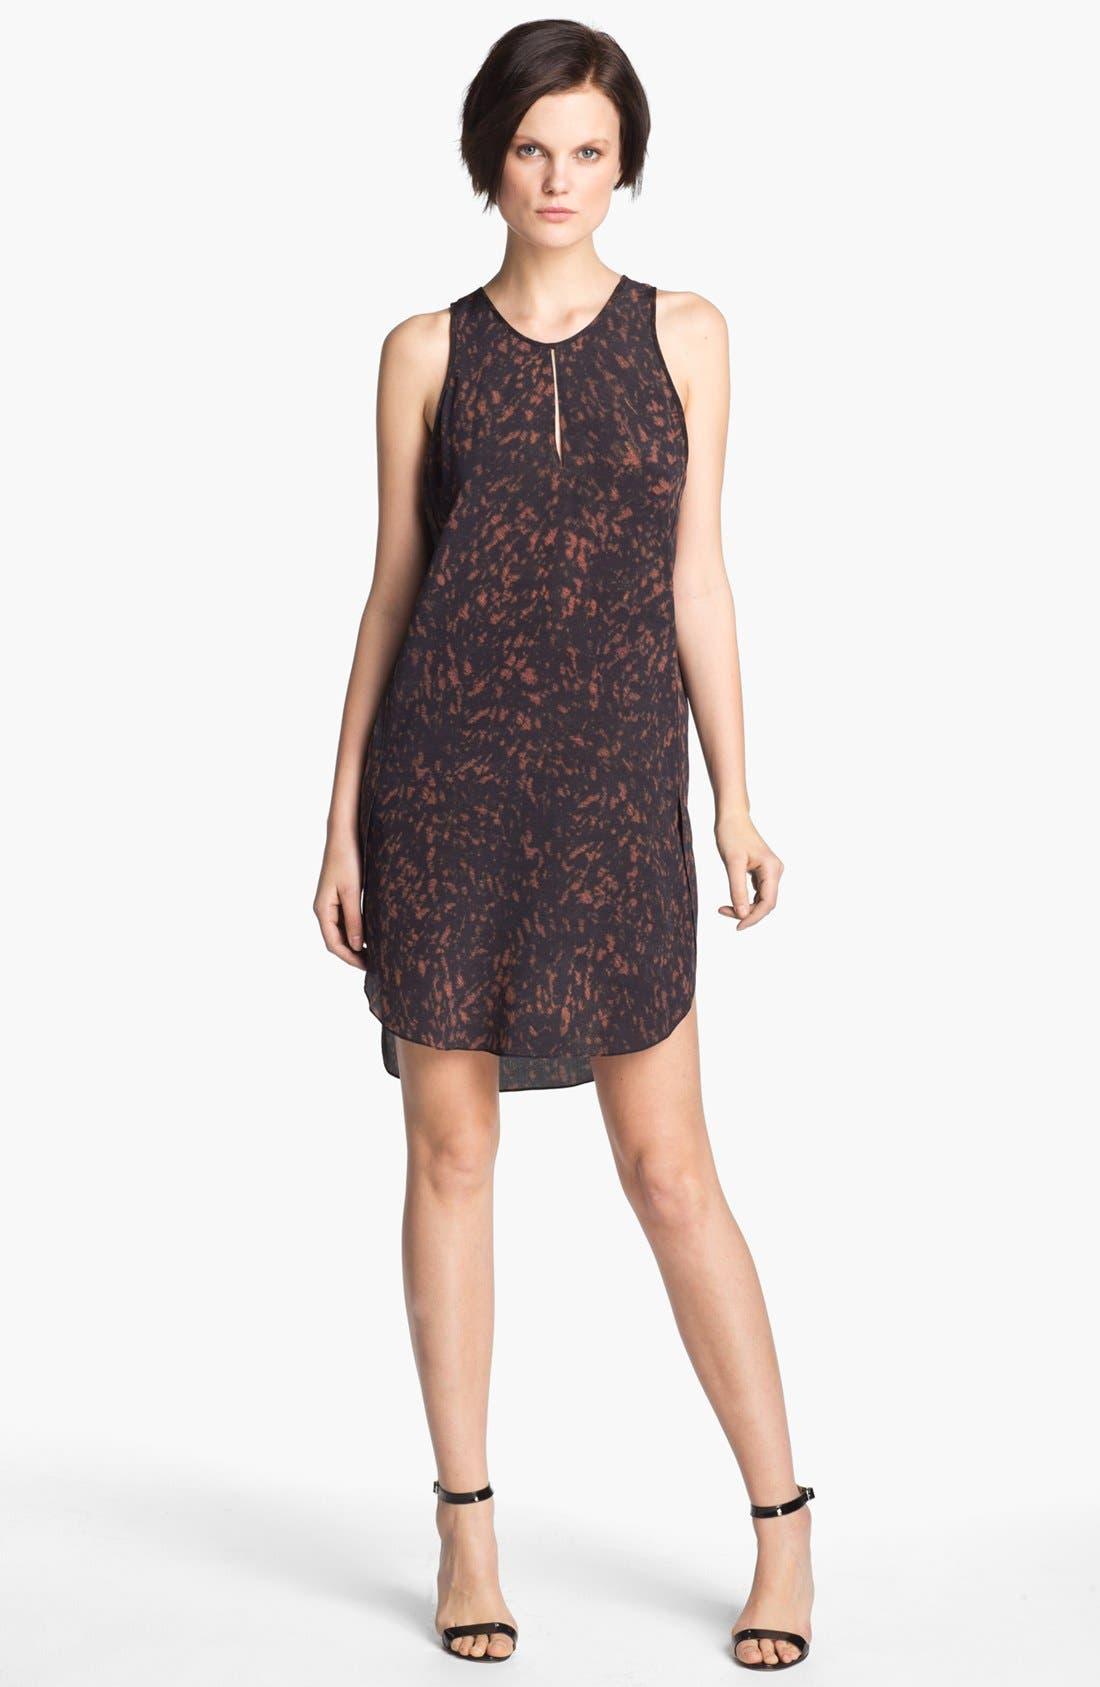 Main Image - 3.1 Phillip Lim Print Silk Tank Dress